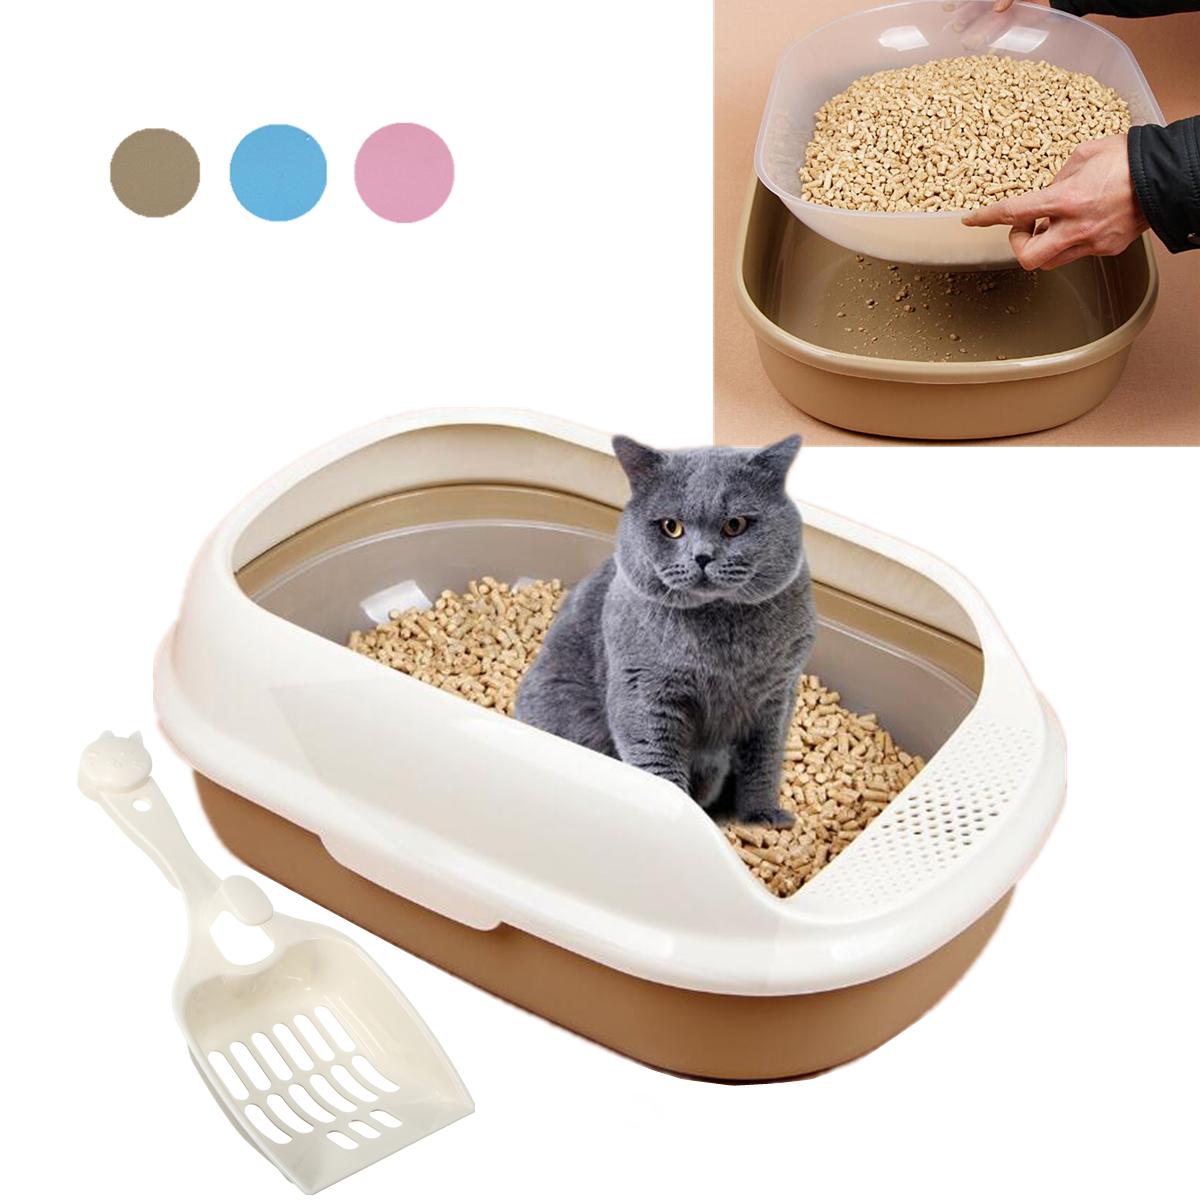 55 38 5 20 plastic cat kitten pet litter box sifting. Black Bedroom Furniture Sets. Home Design Ideas